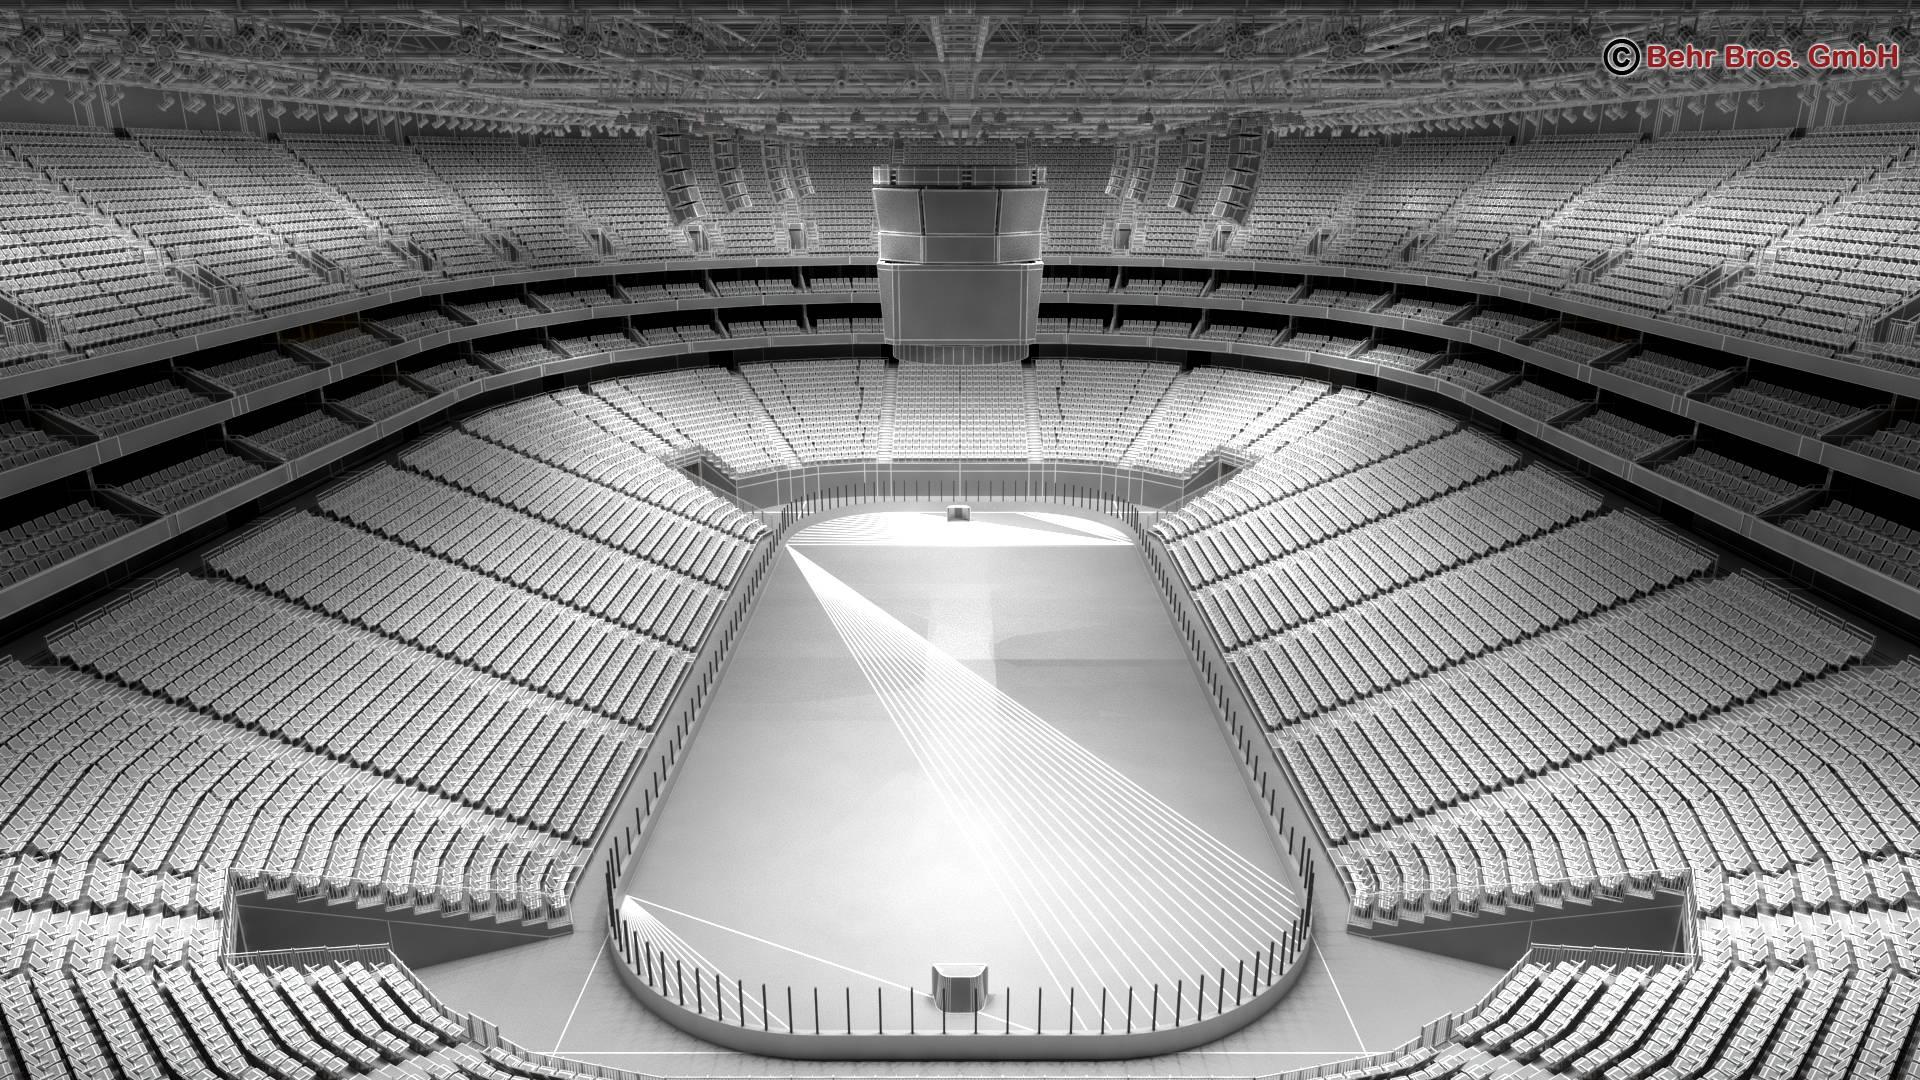 ice hockey arena v2 3d model 3ds max fbx c4d lwo ma mb obj 251660